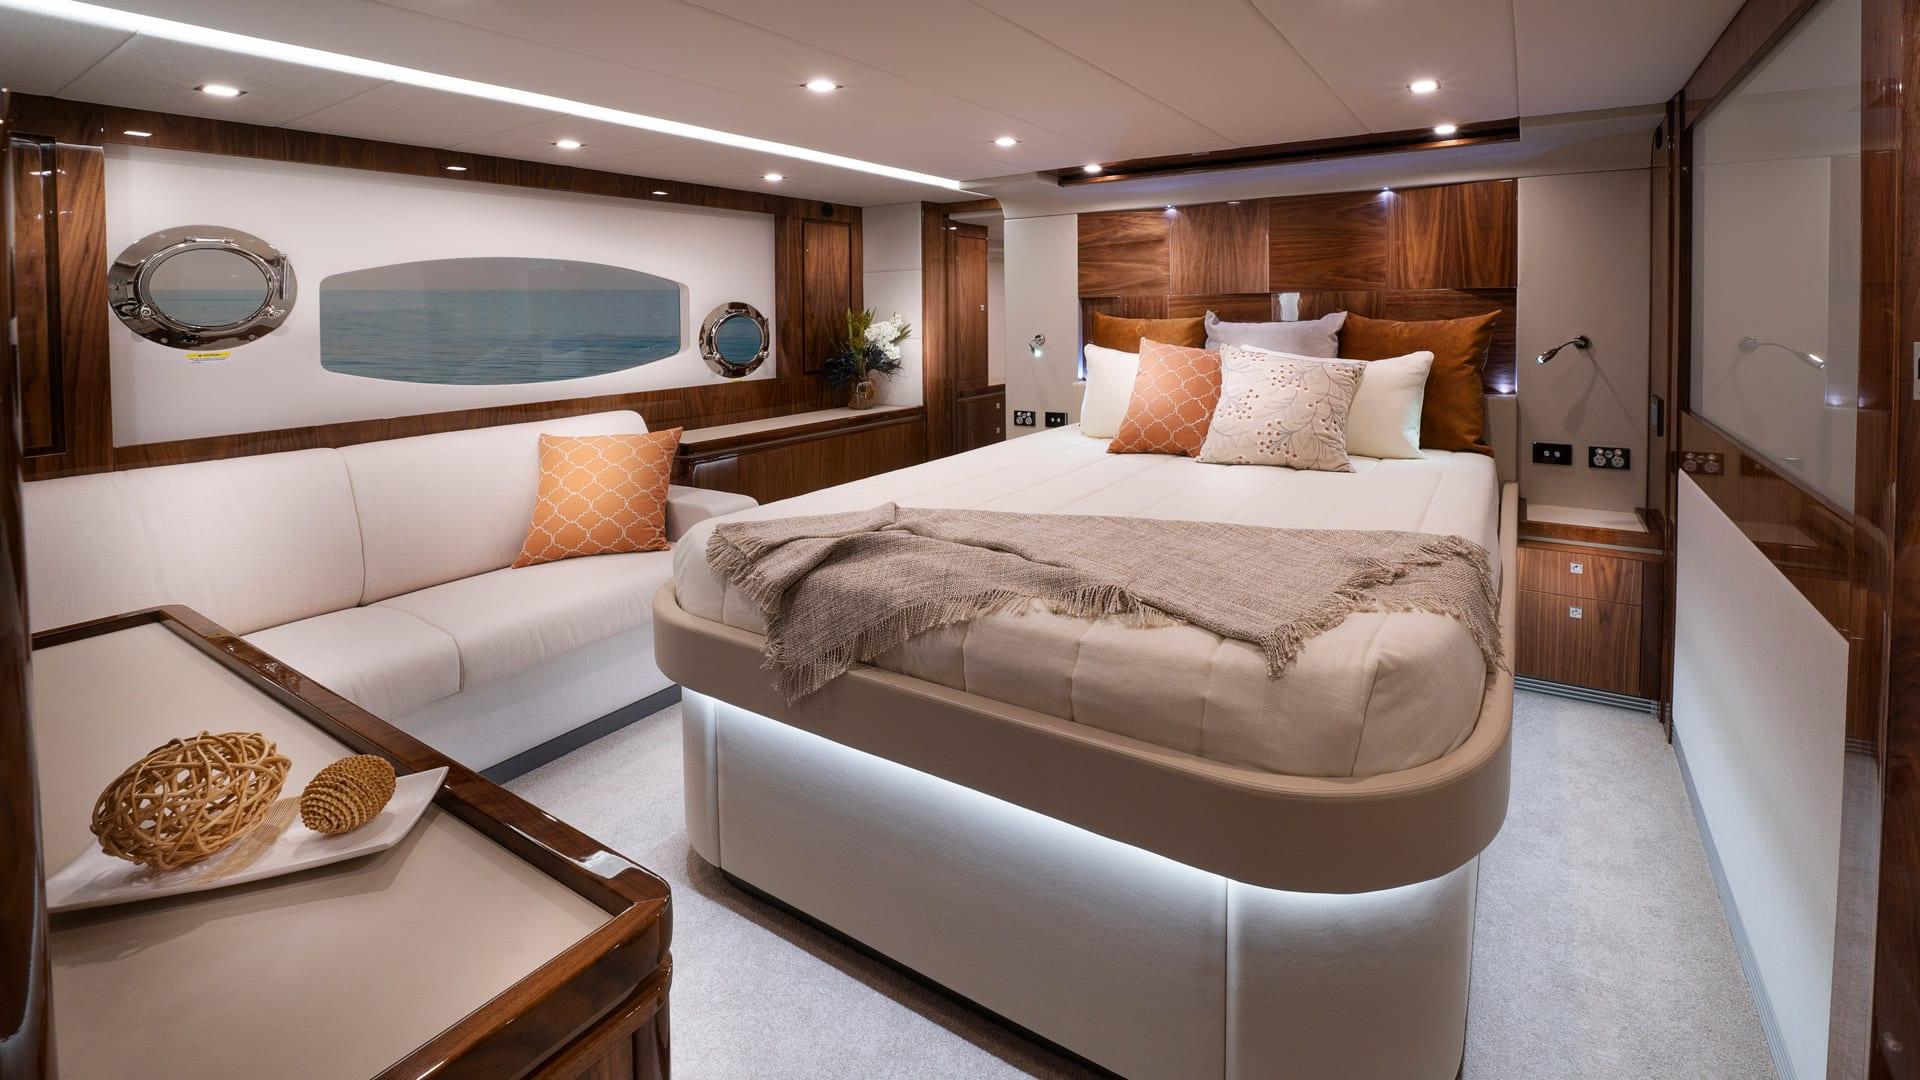 Riviera 6000 Sport Yacht Platinum Edition Master Stateroom 01 – Gloss Walnut Timber Finish